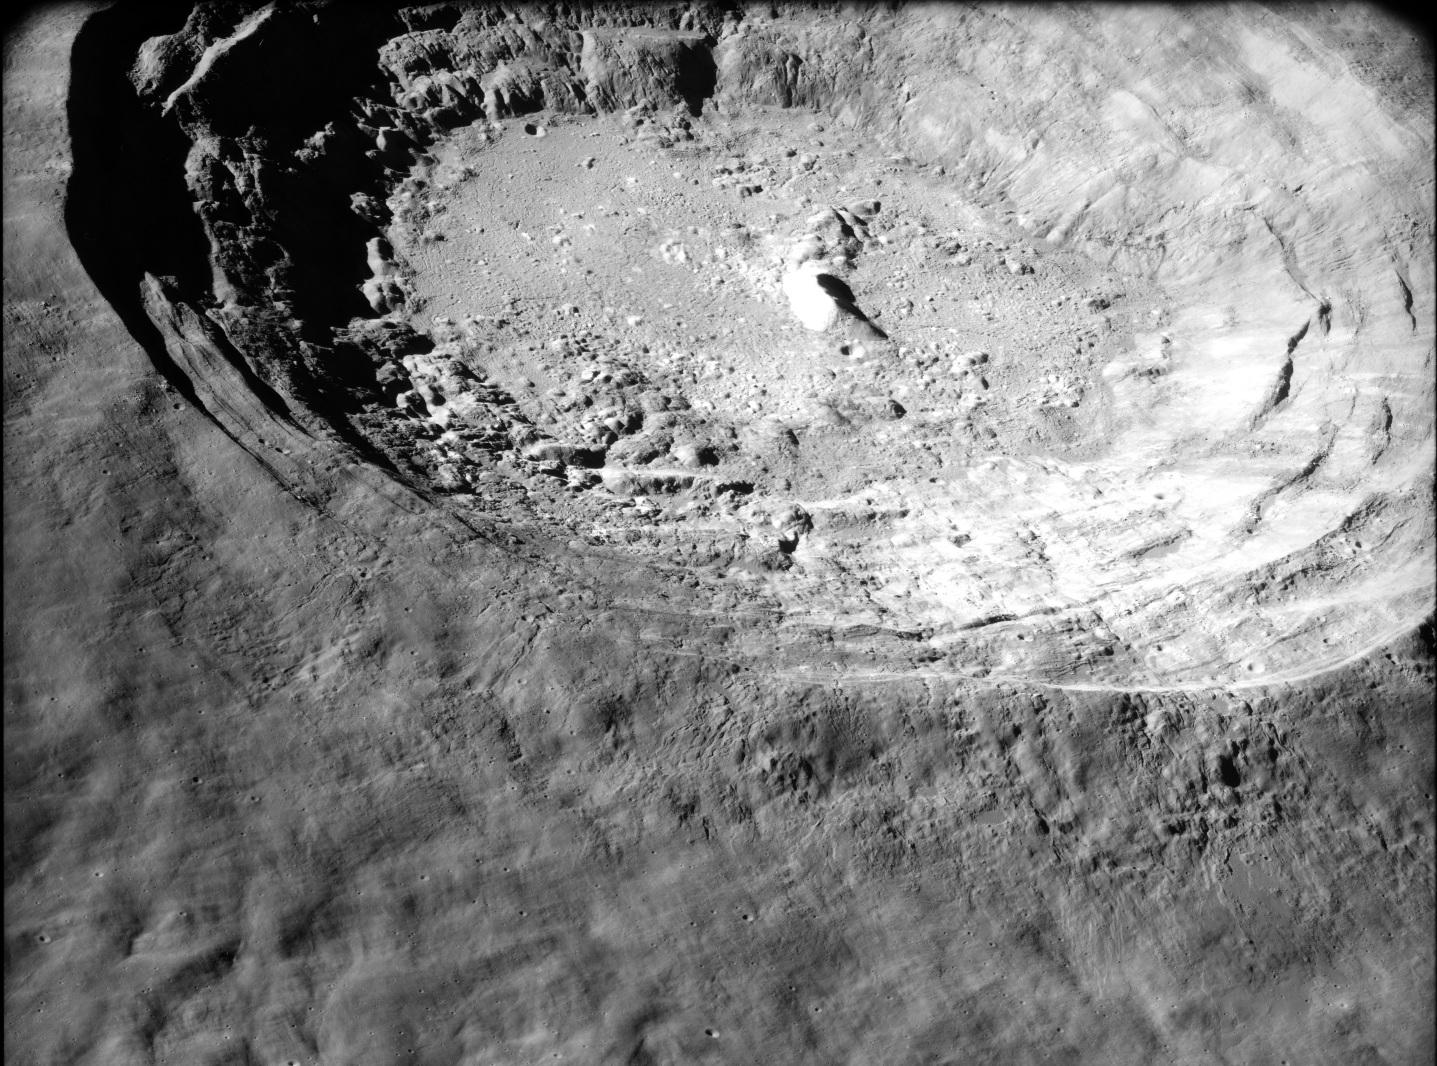 File:Aristarchus crater hrp162.jpg.